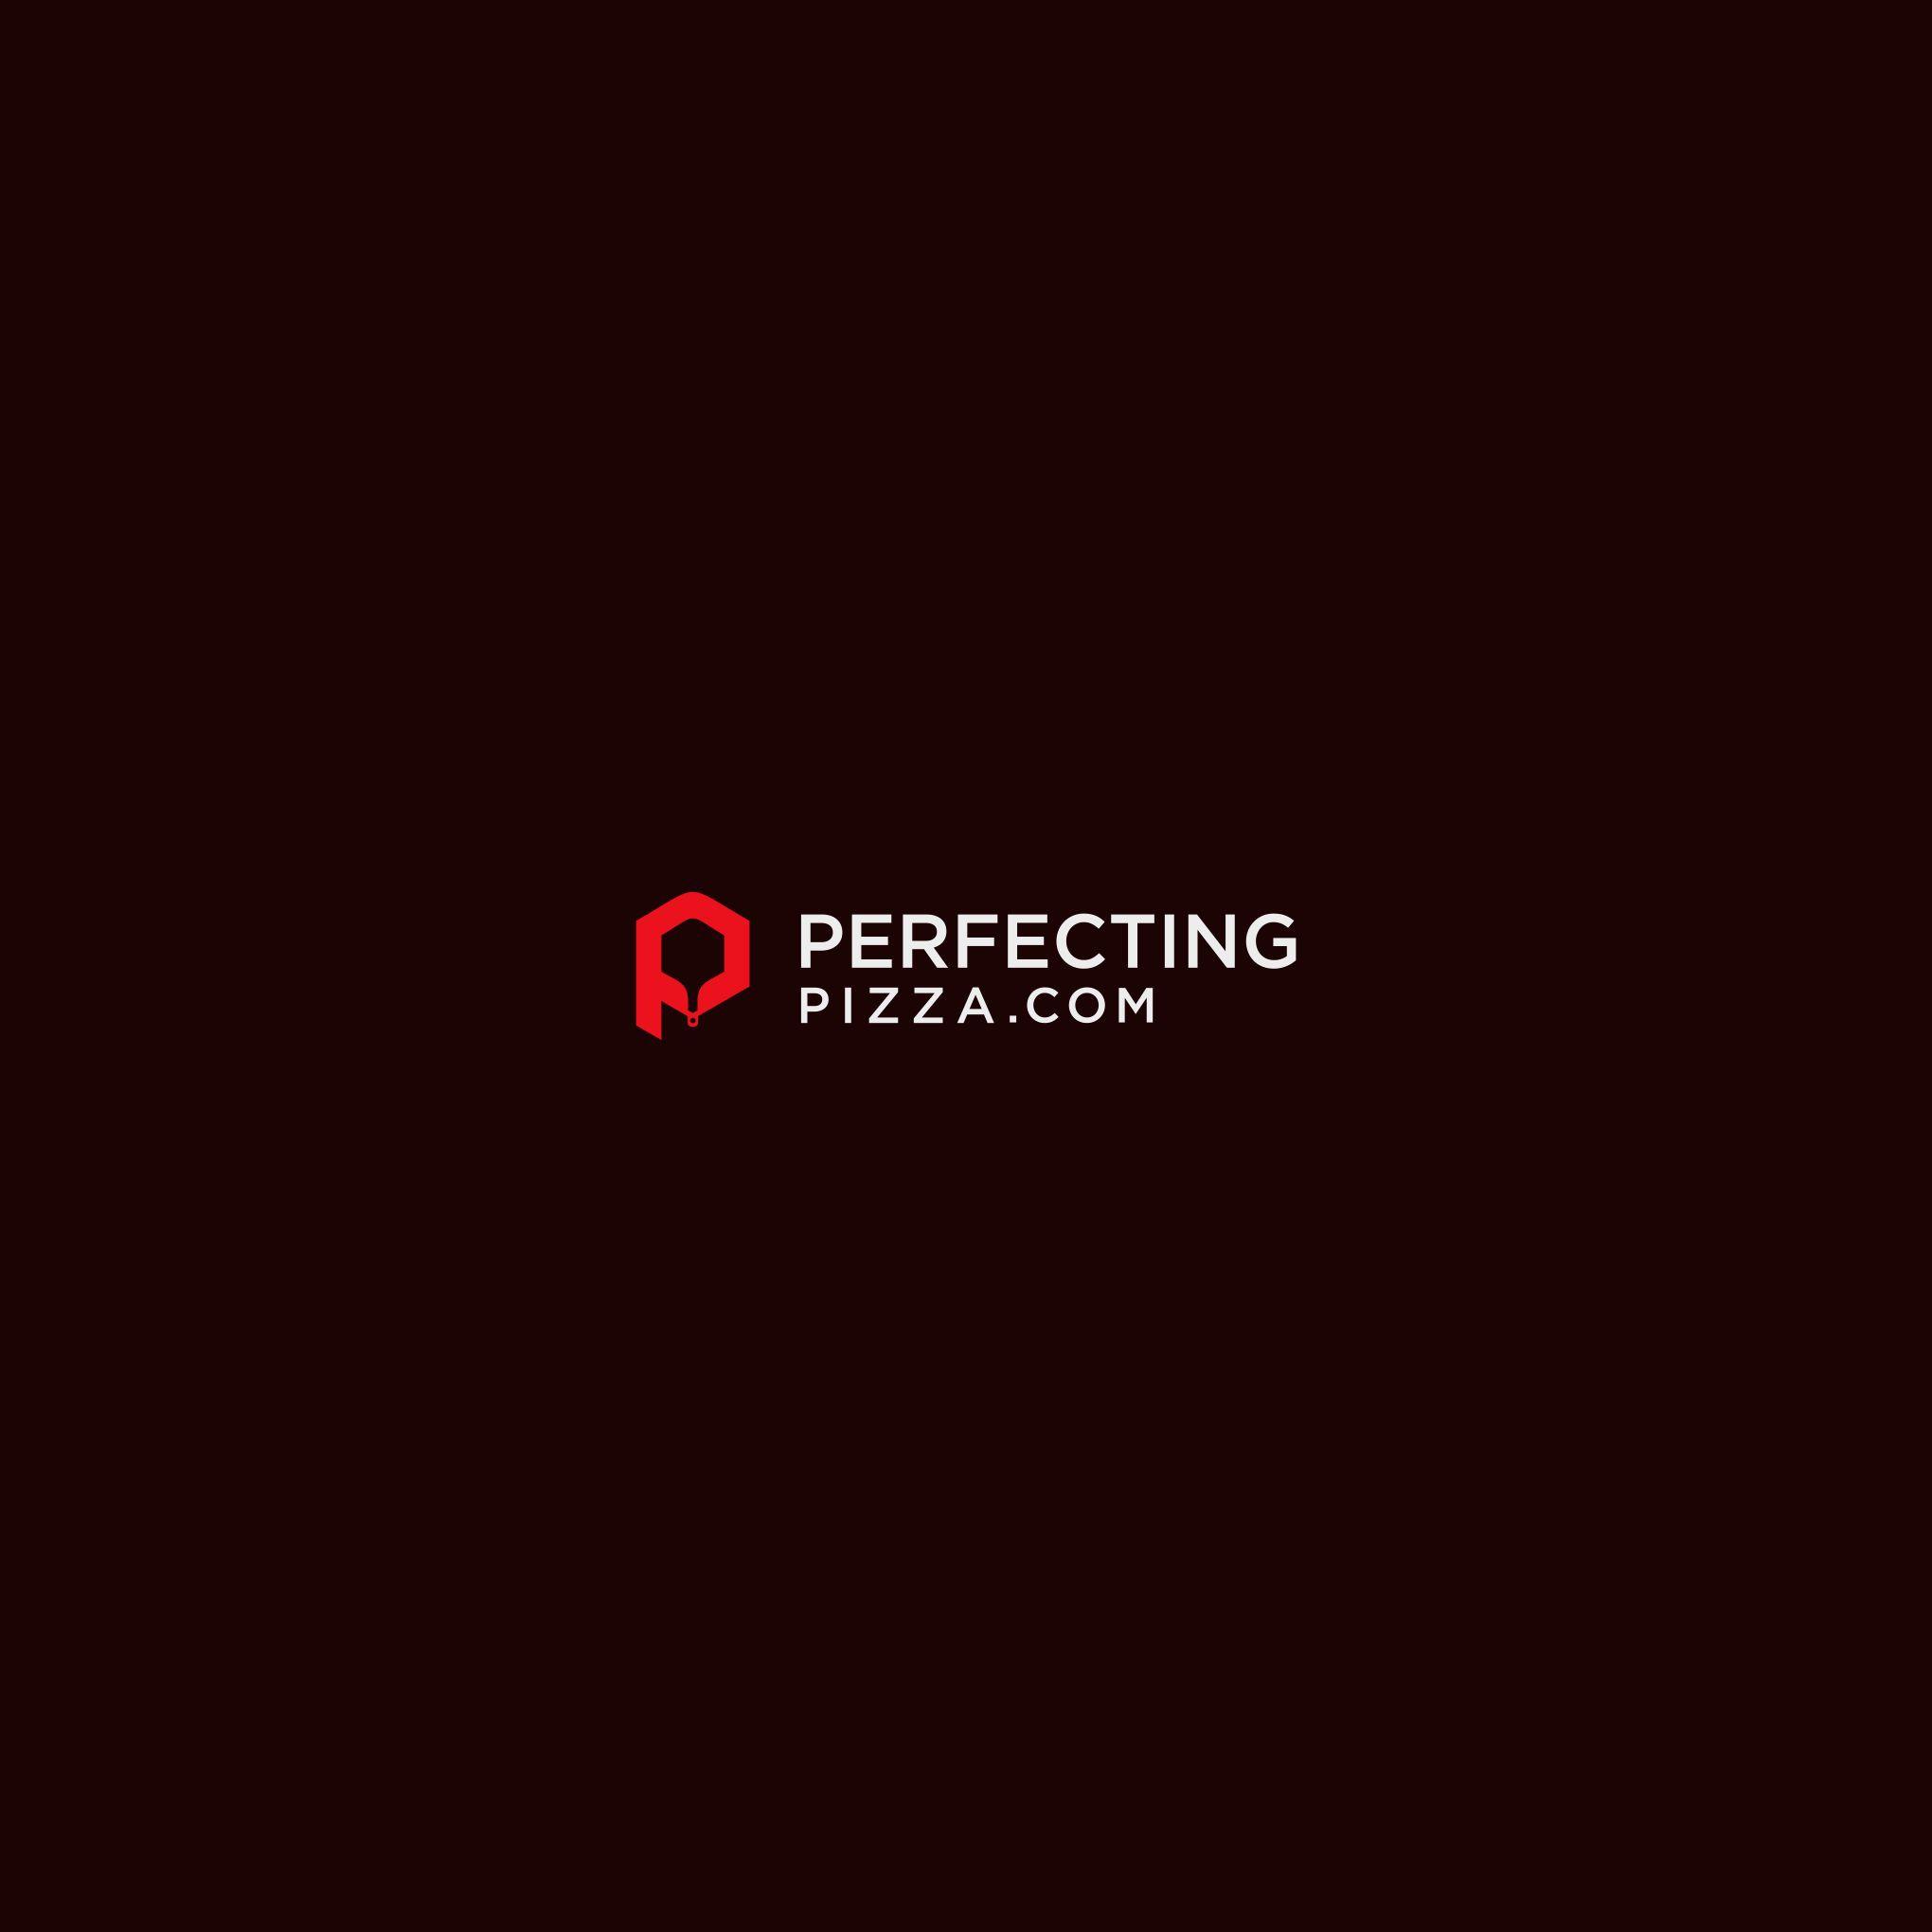 Web Based perfectingpizza.com needs a Clean & Refined Logo